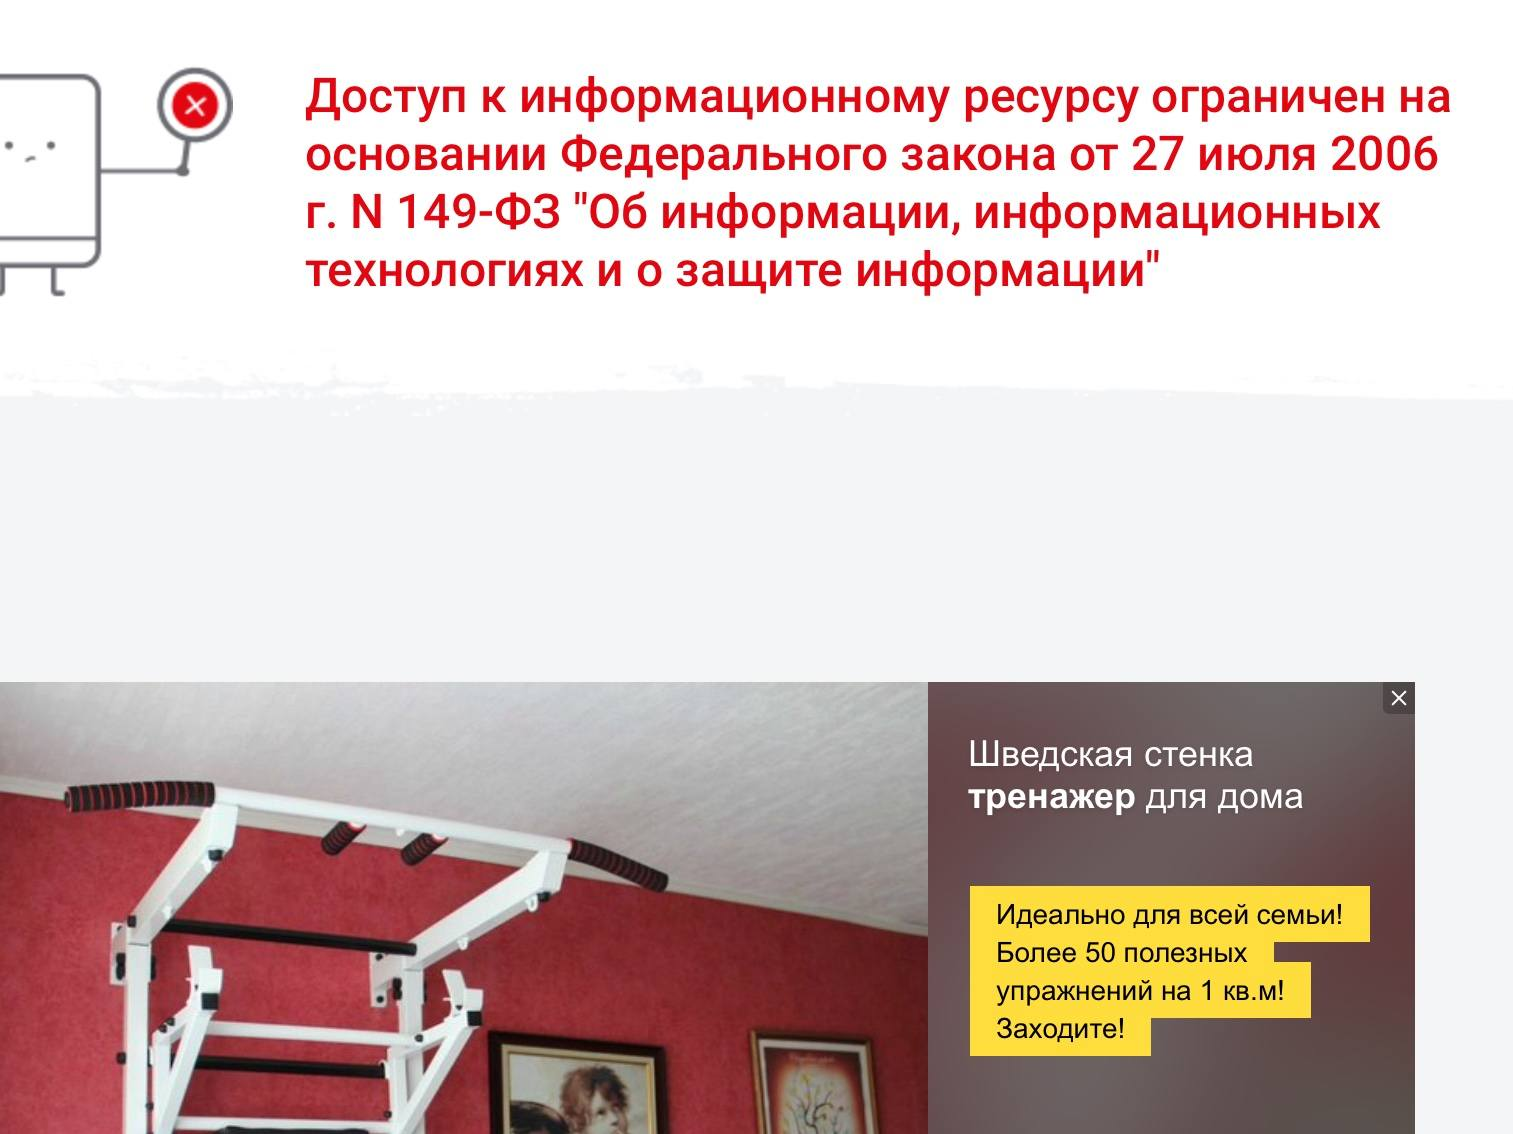 http://images.vfl.ru/ii/1547480371/27bfba18/24949764.jpg